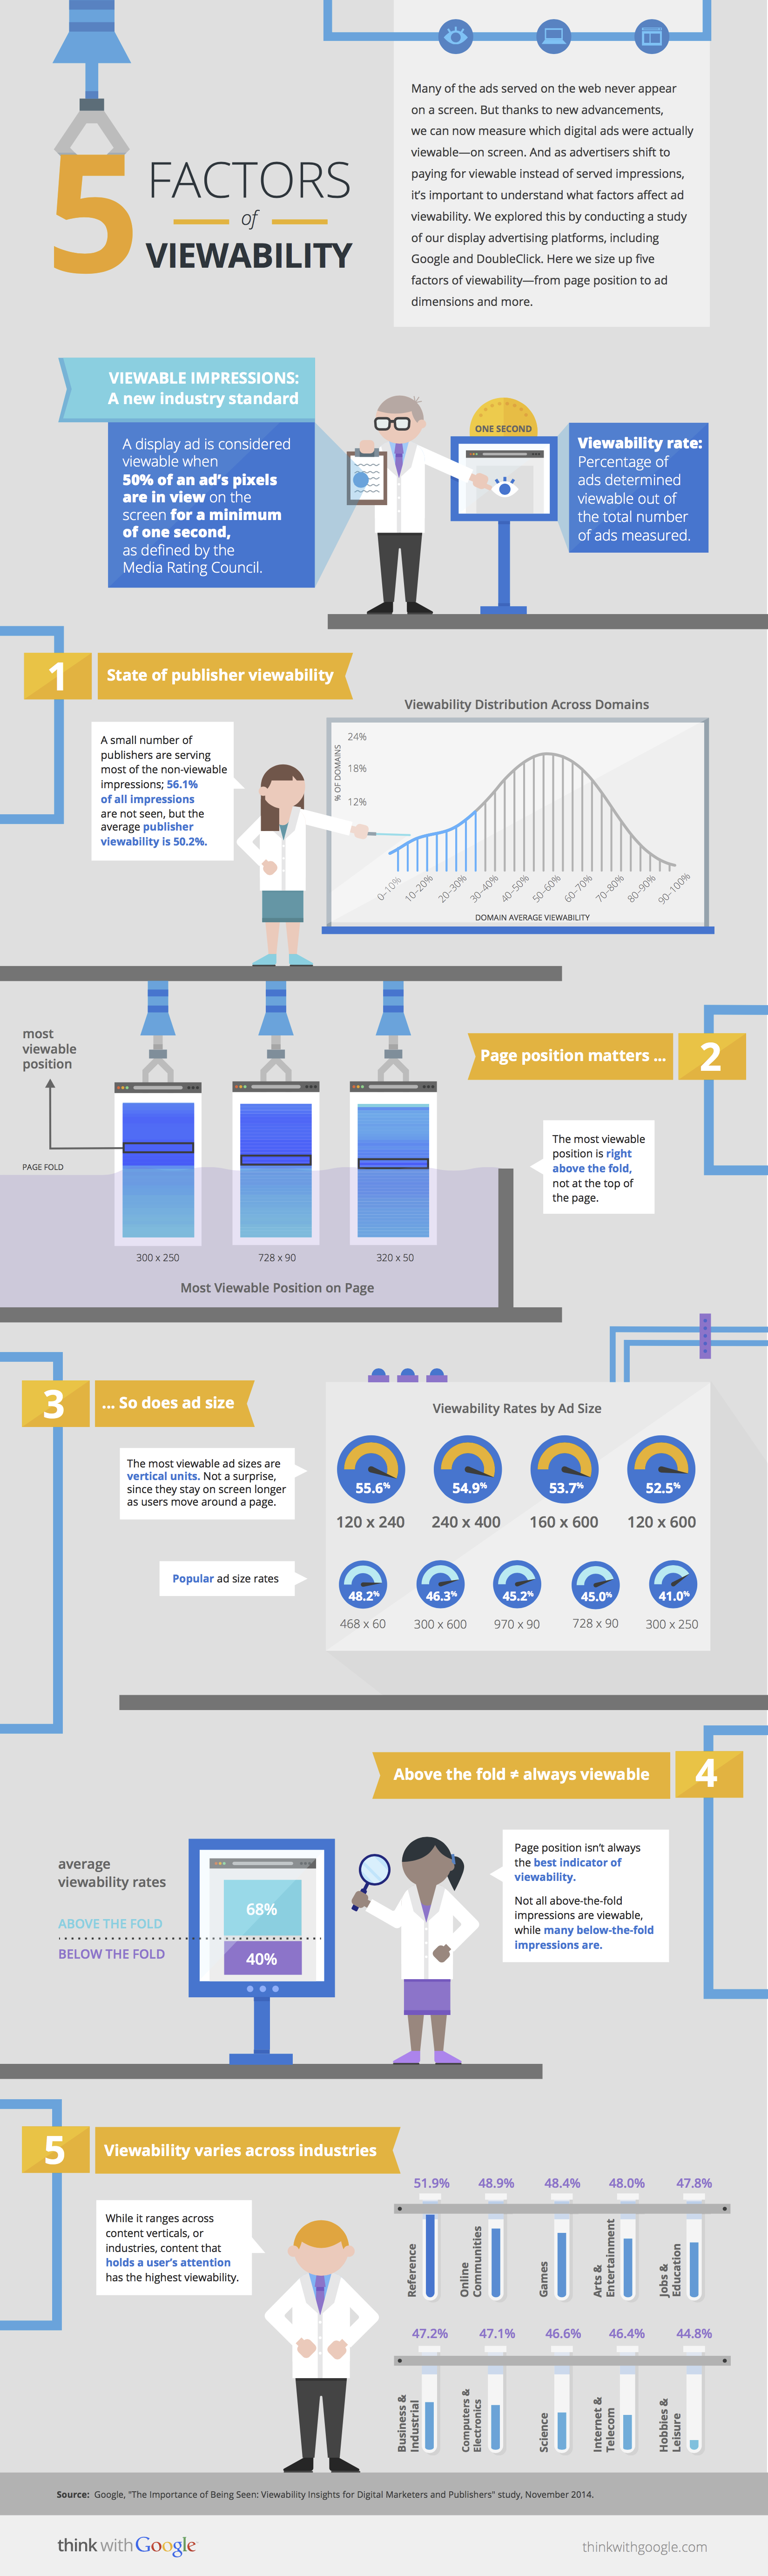 5-factors-of-viewability_infographics